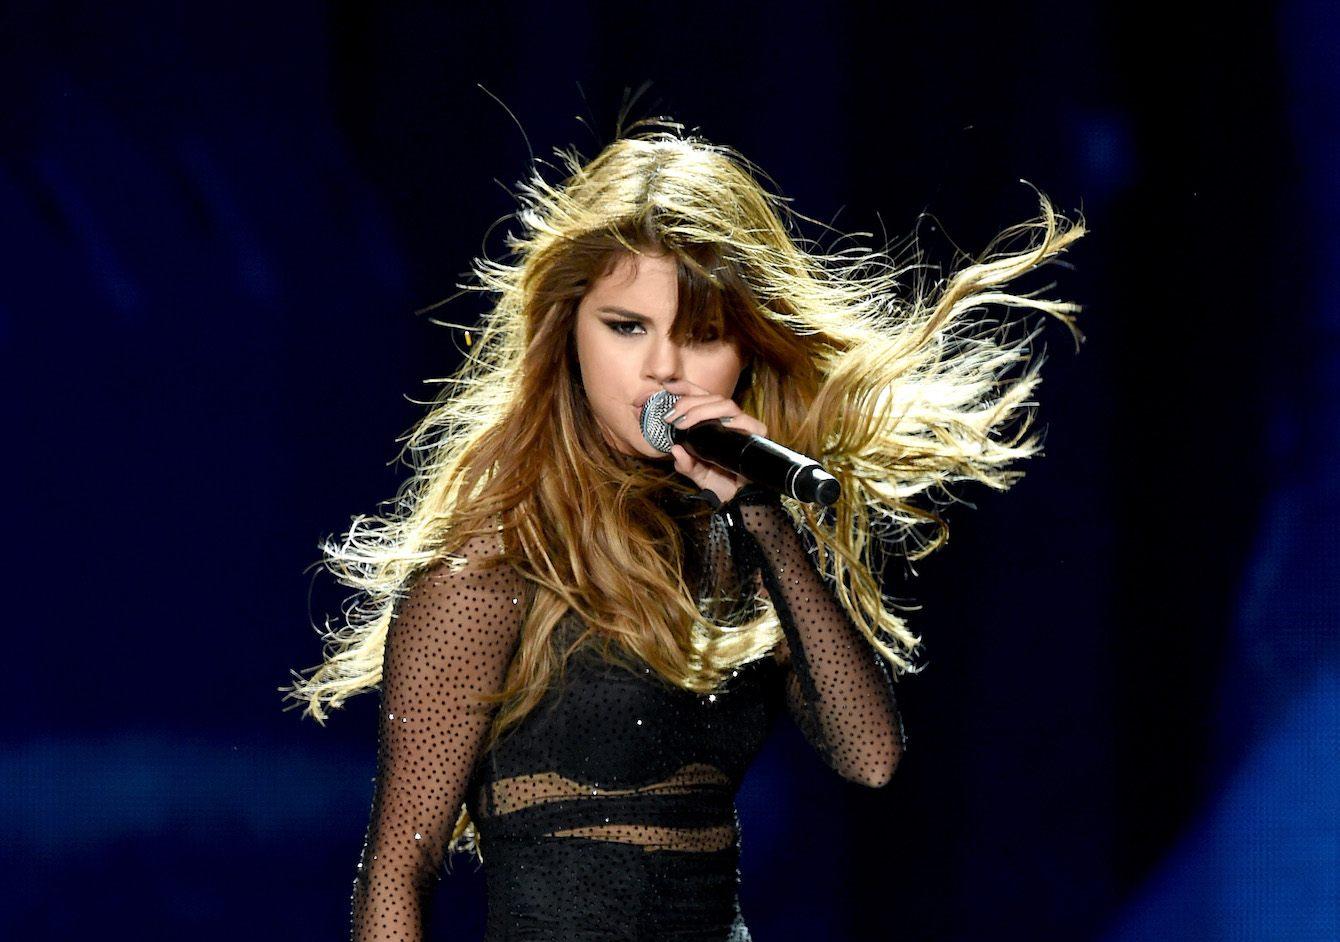 Selena Gomez sings on stage as her hair is blowing in the wind.